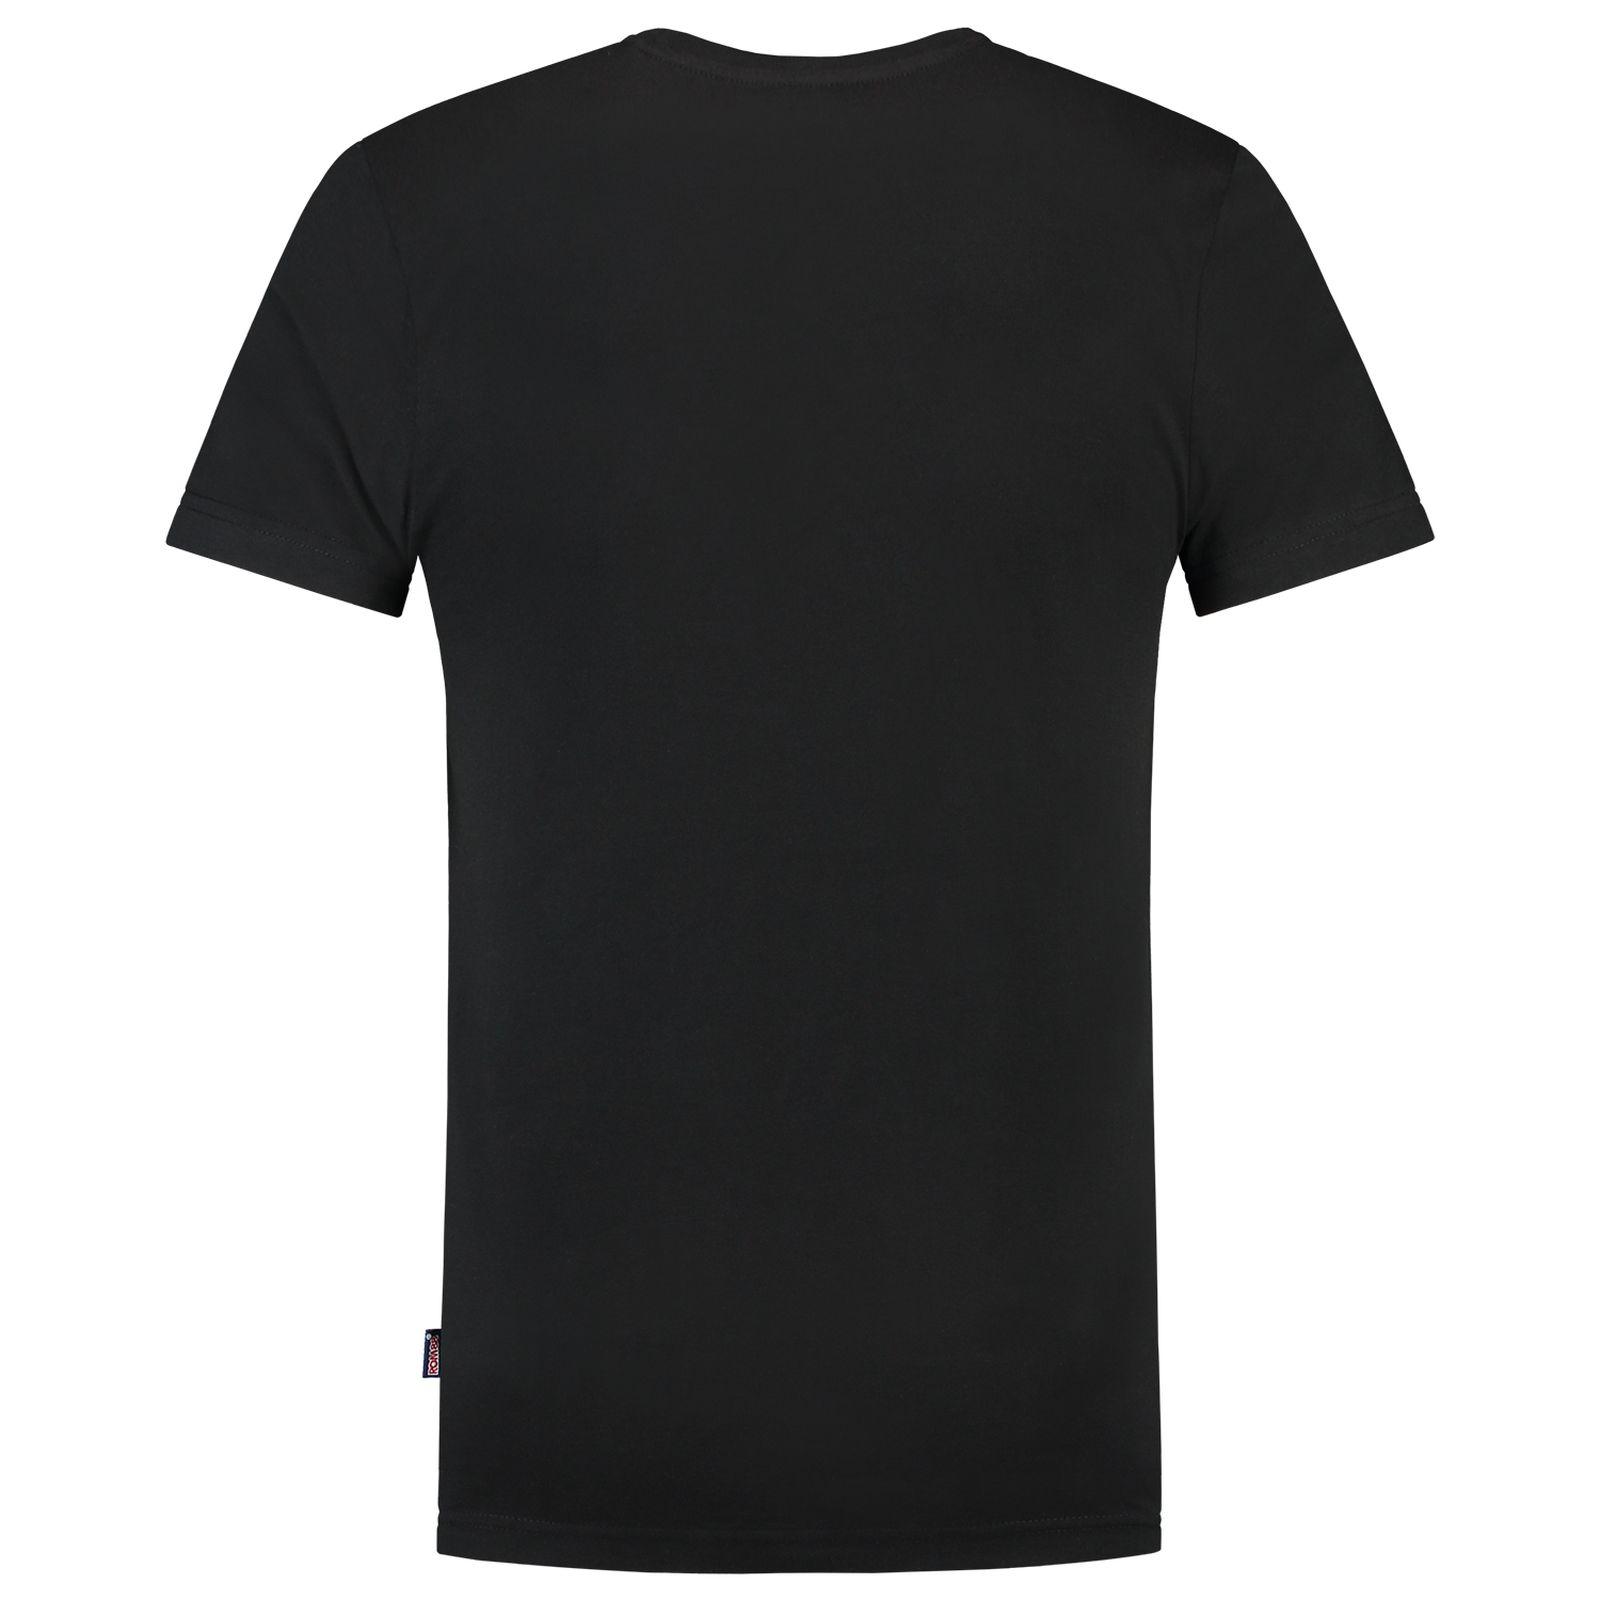 Tricorp Casual Kinderkleding T-shirts 101014-TFR160 zwart(Black)